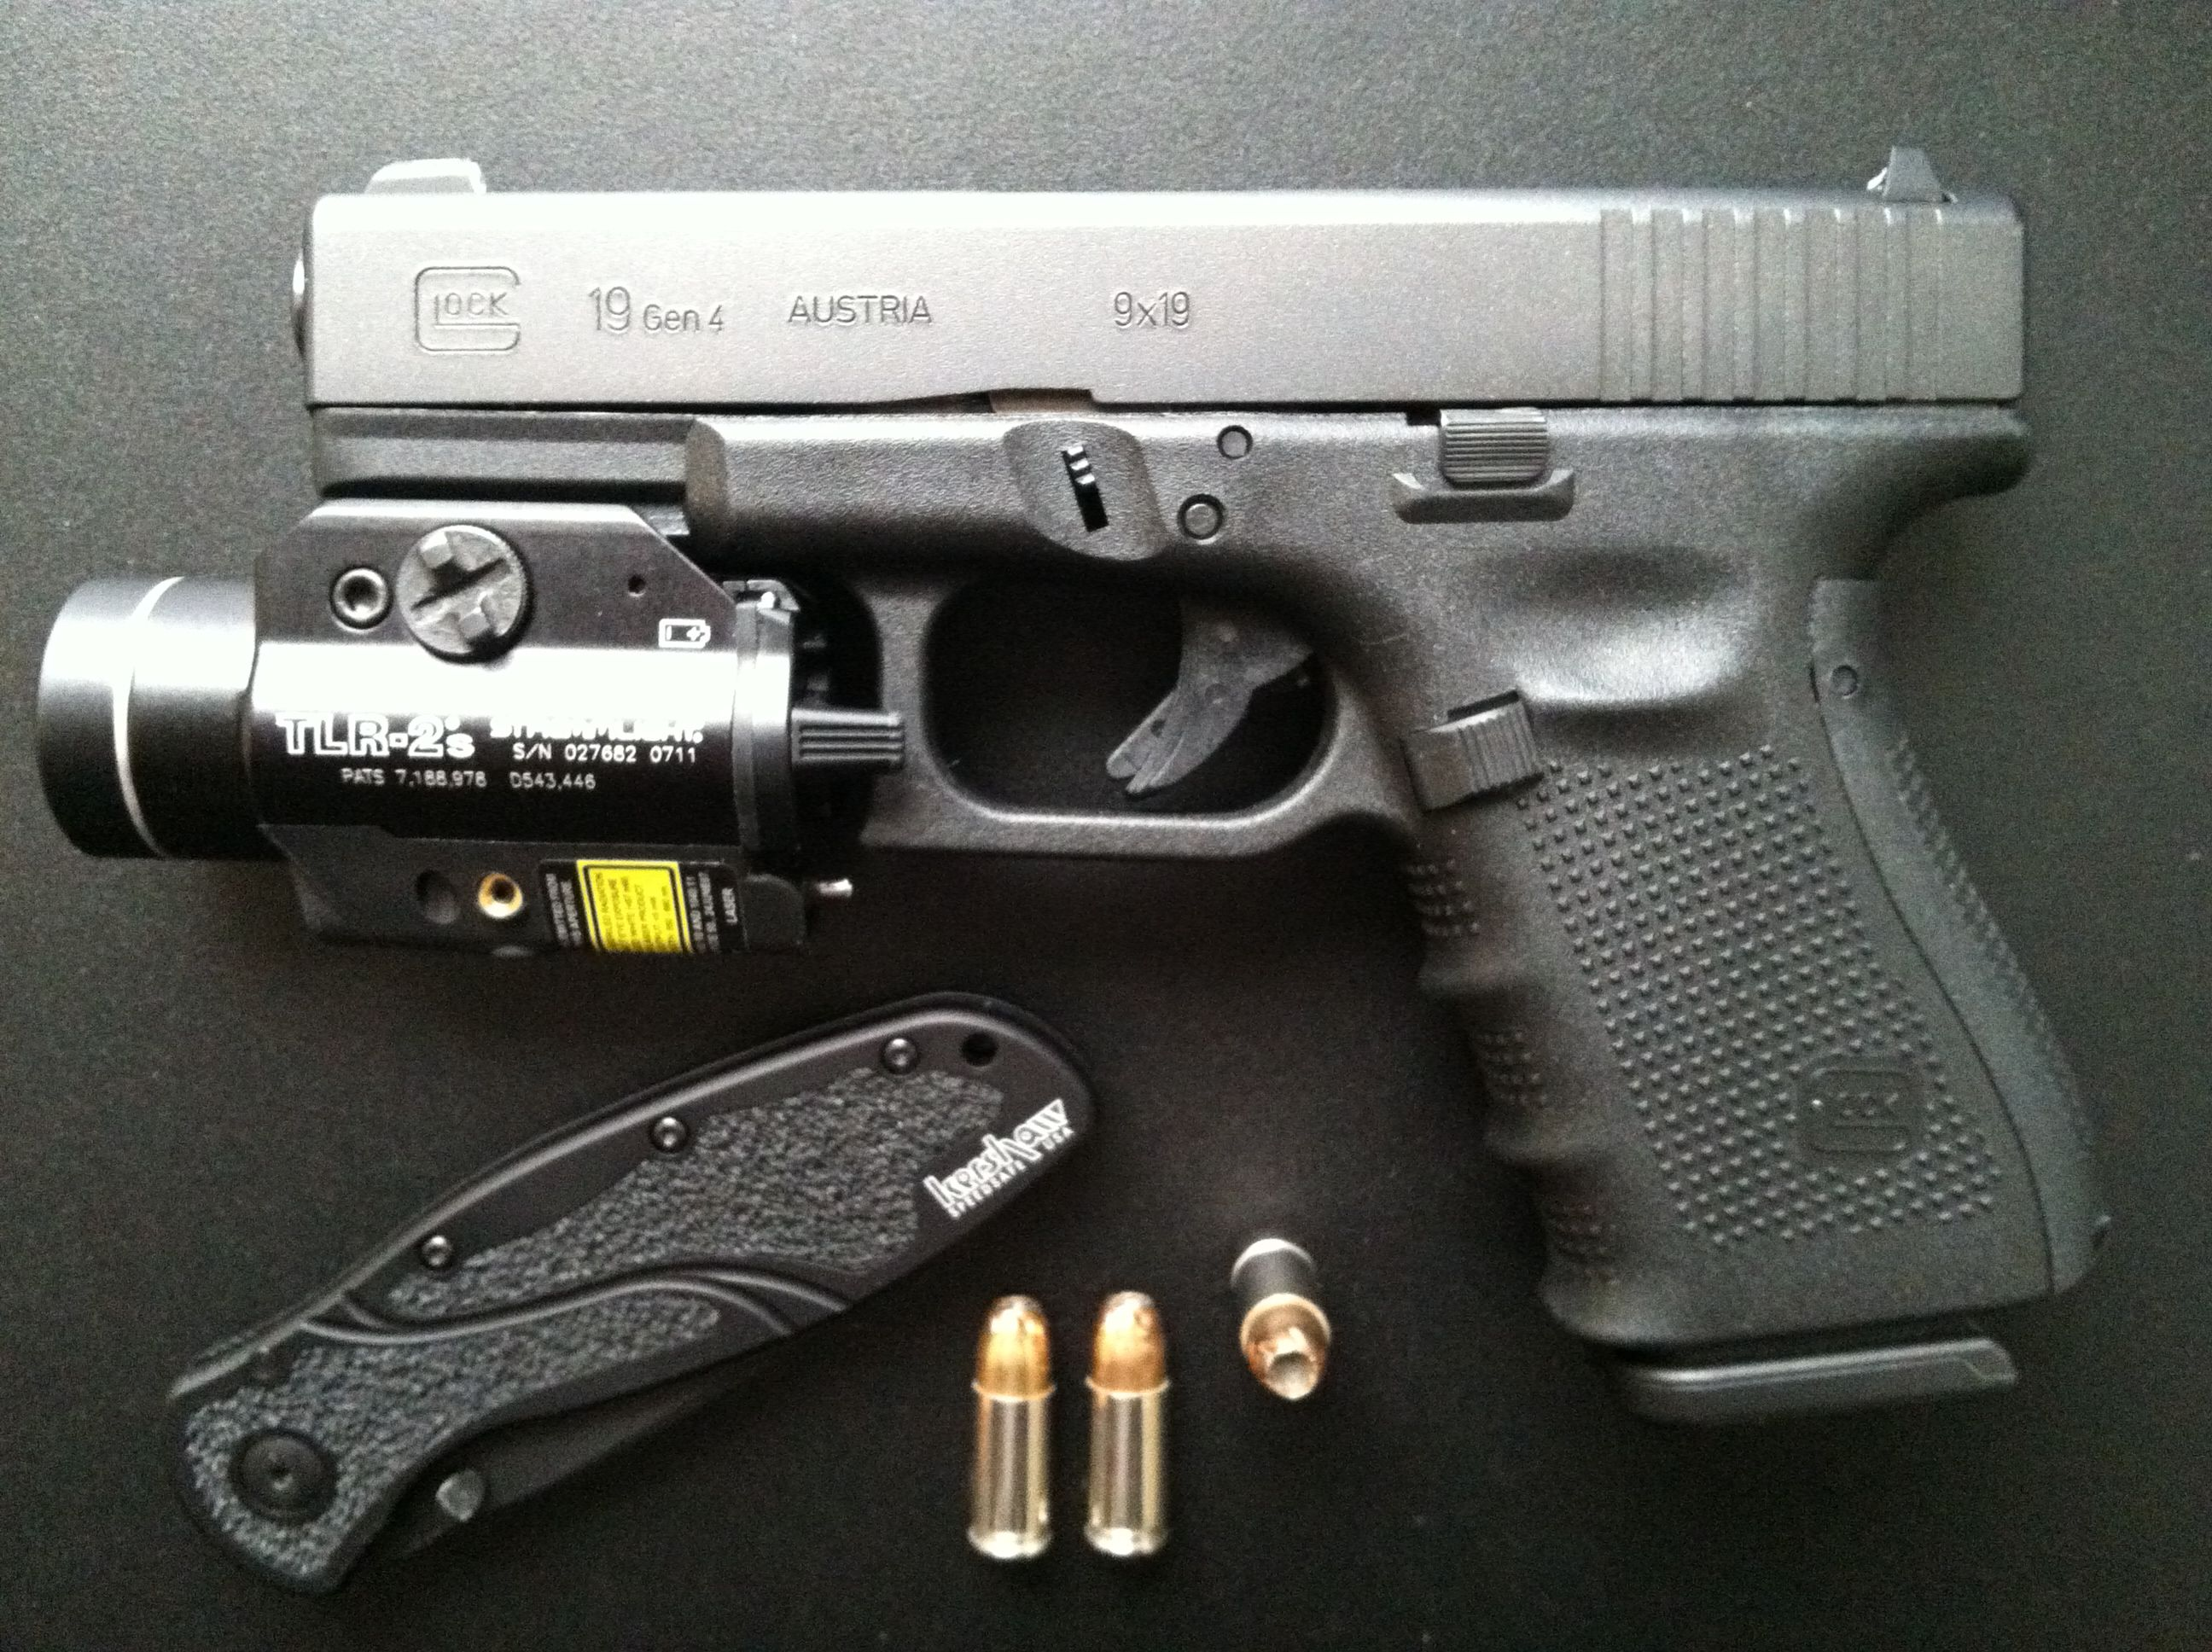 Handguns Weapons, Boom Stick, Glock 19, 2S Weapon ...